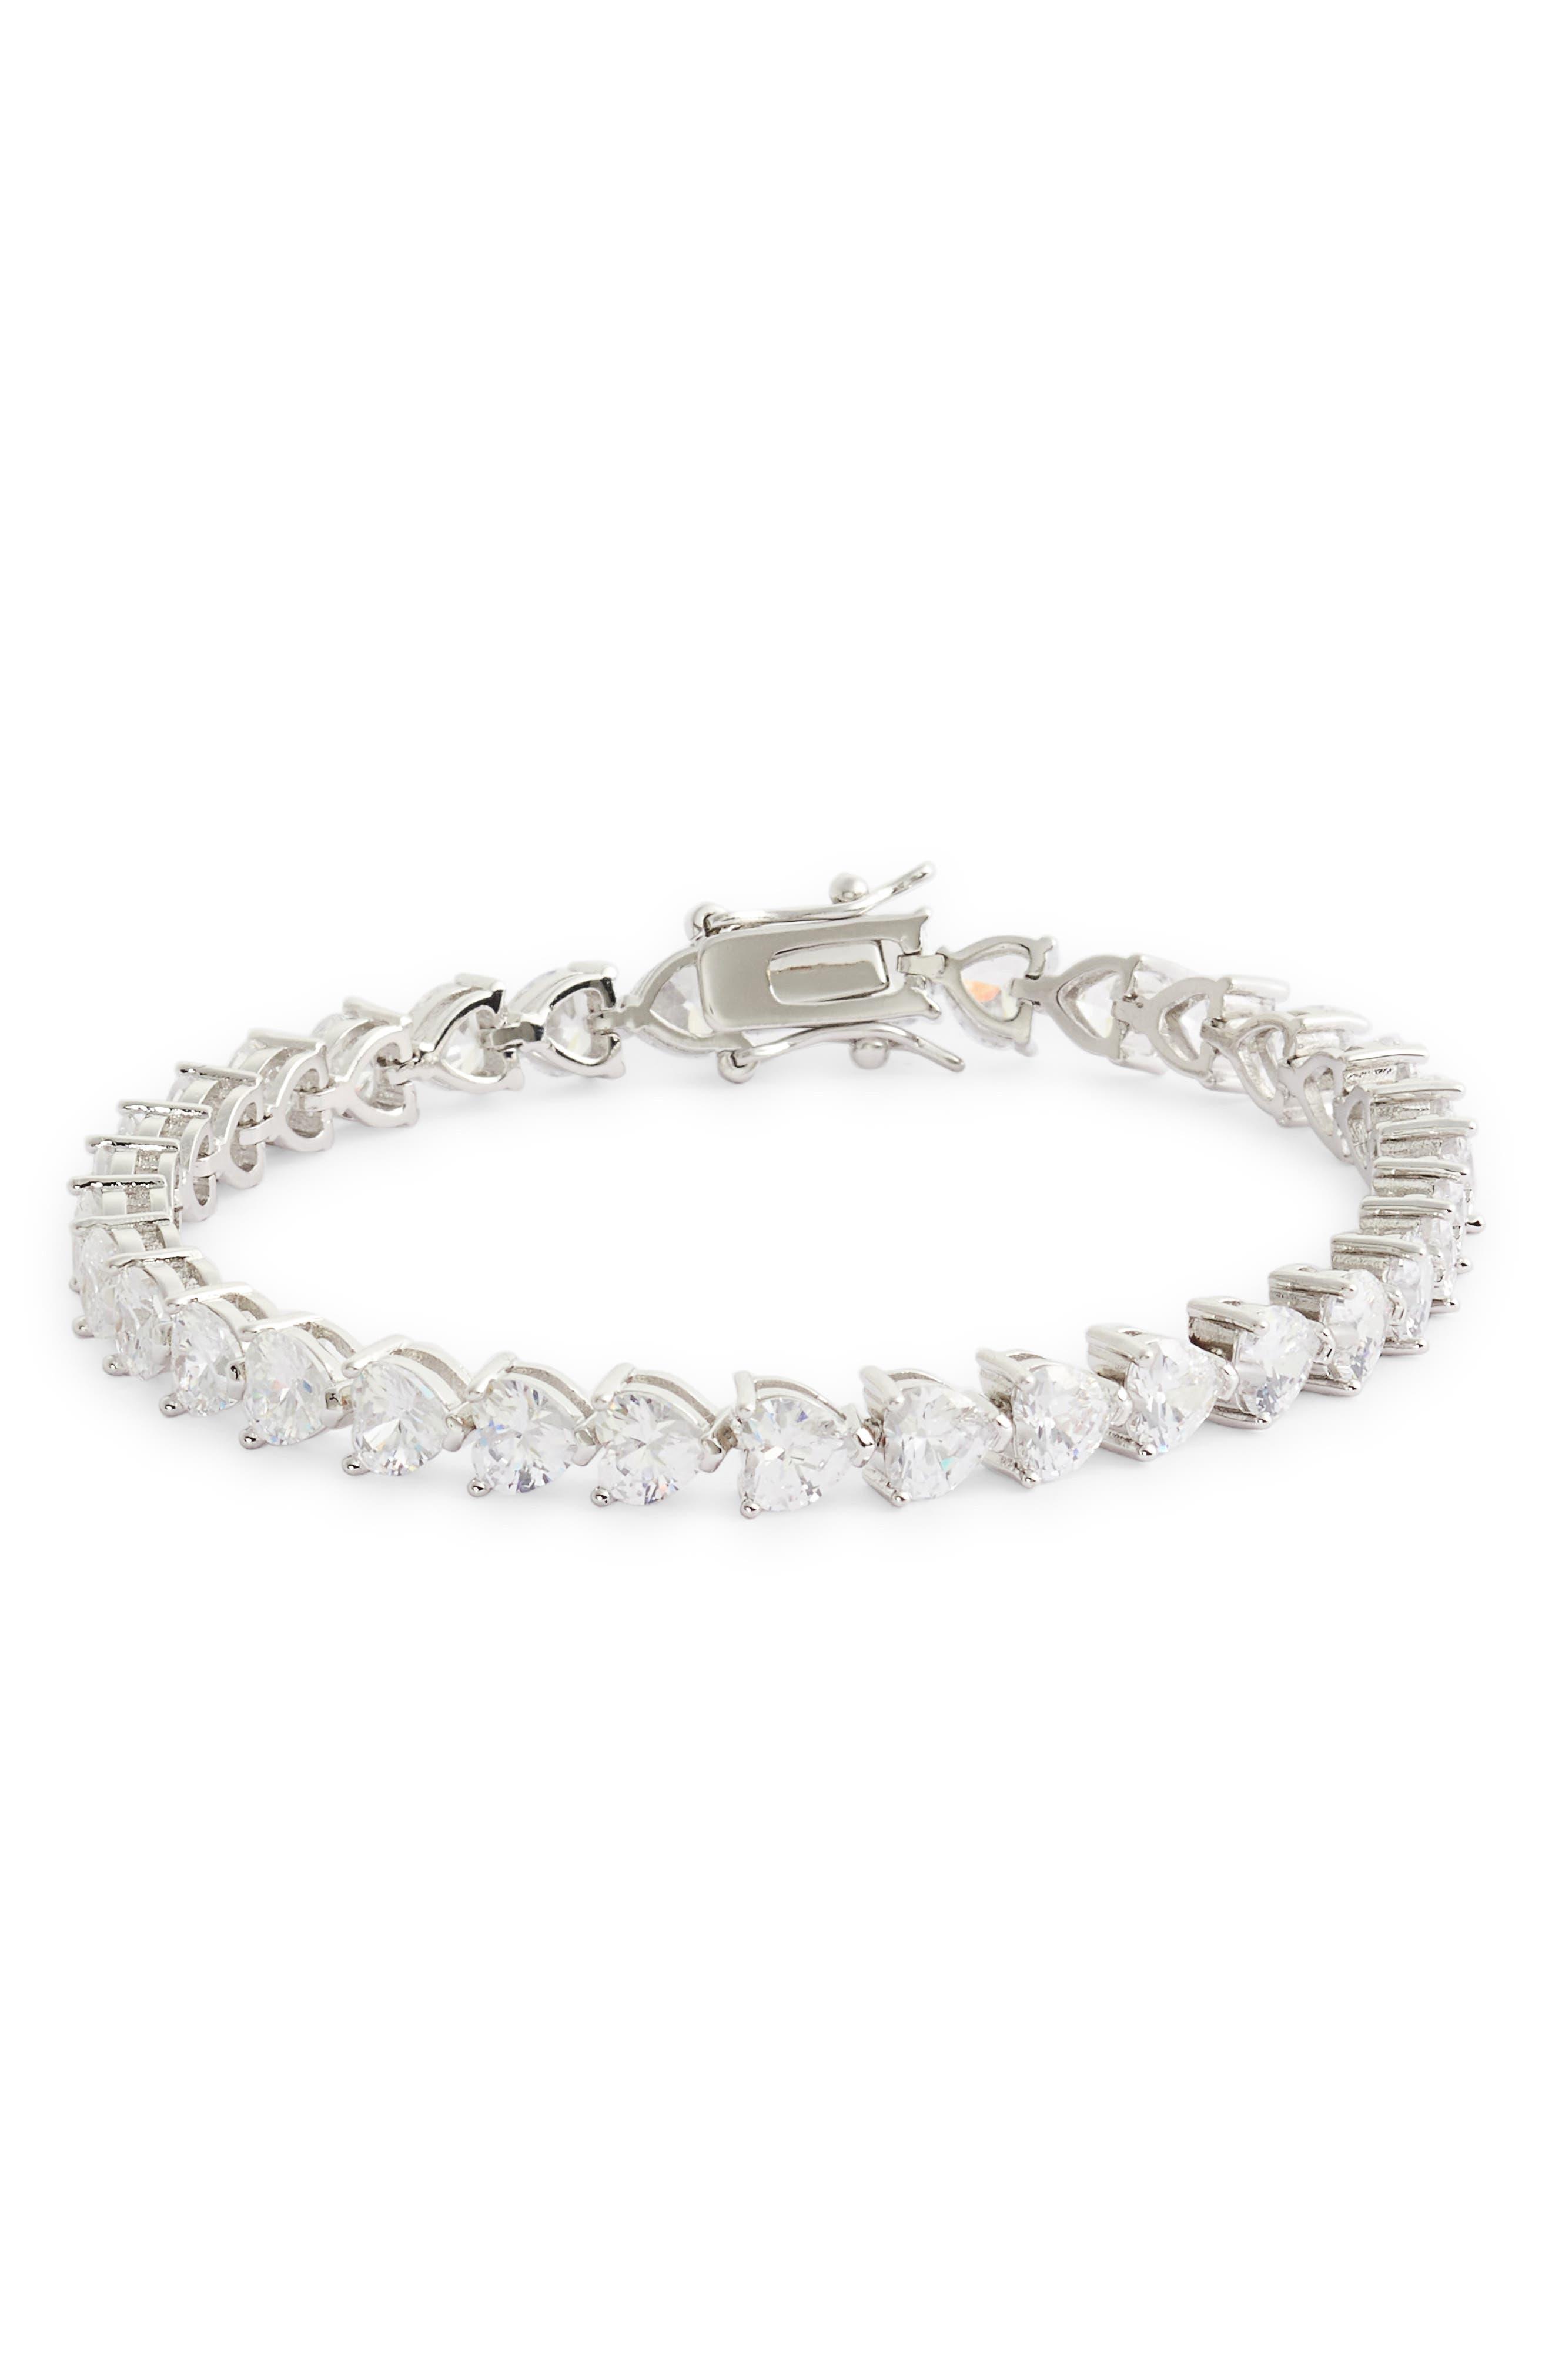 Heart Shaped Cubic Zirconia Link Bracelet,                             Main thumbnail 1, color,                             WHITE/ SILVER